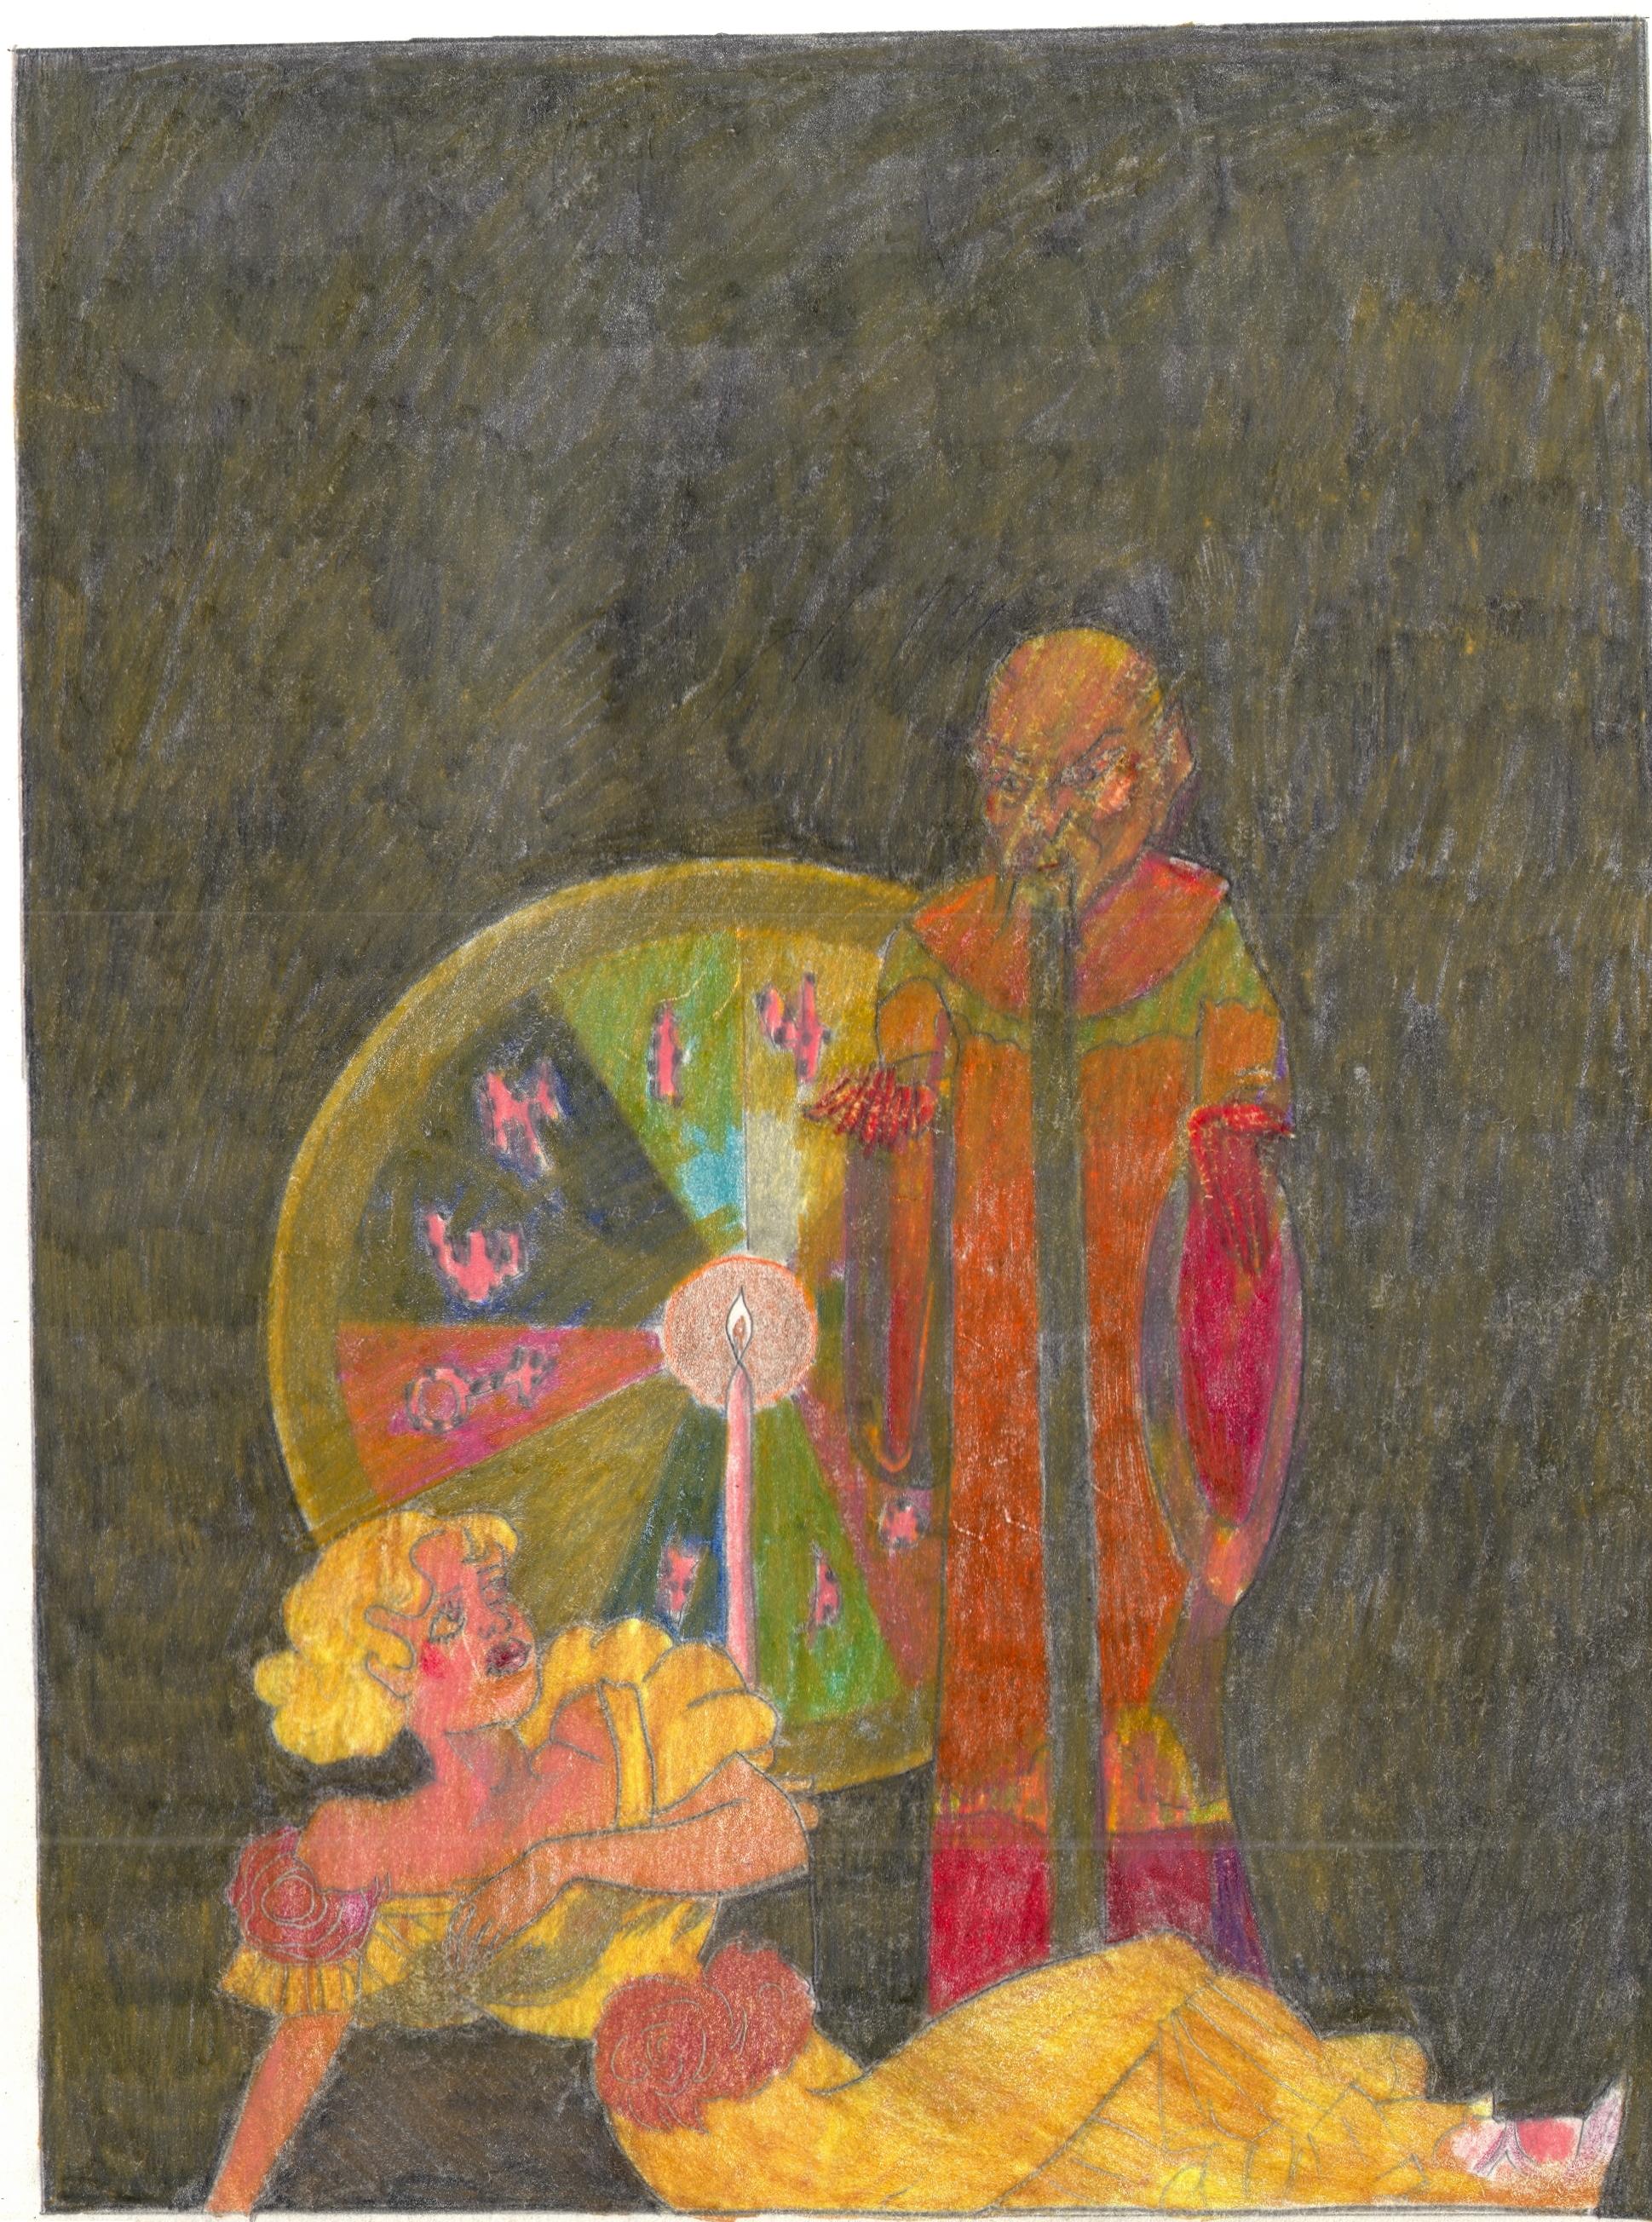 O.T. ( Serie Weird Tales II ), 2018  Bleistift Buntstift auf Papier, 26x35.5cm